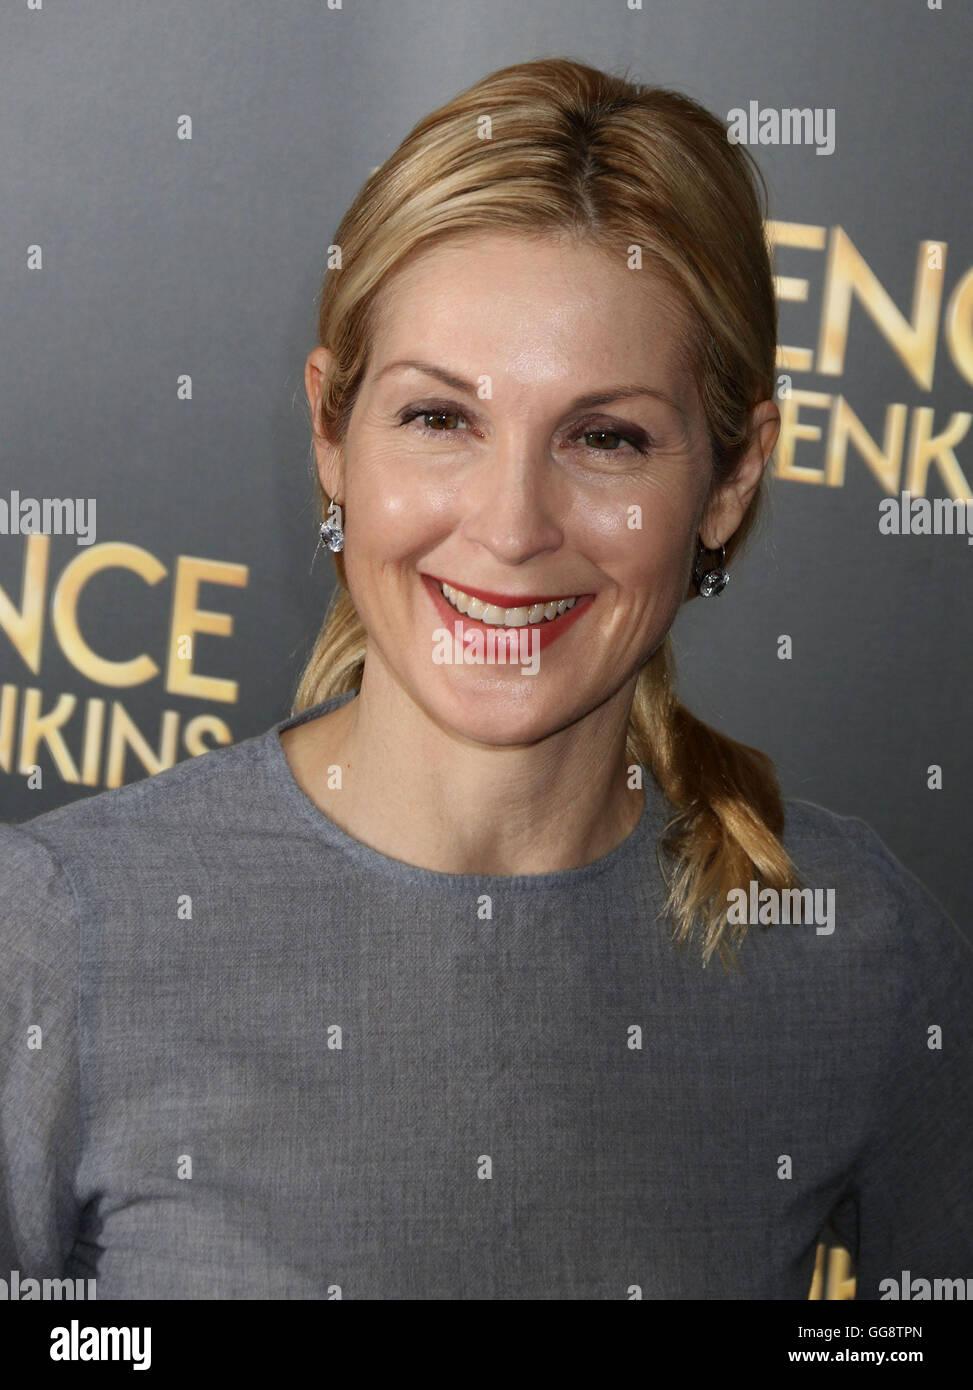 kelly jenkins actress